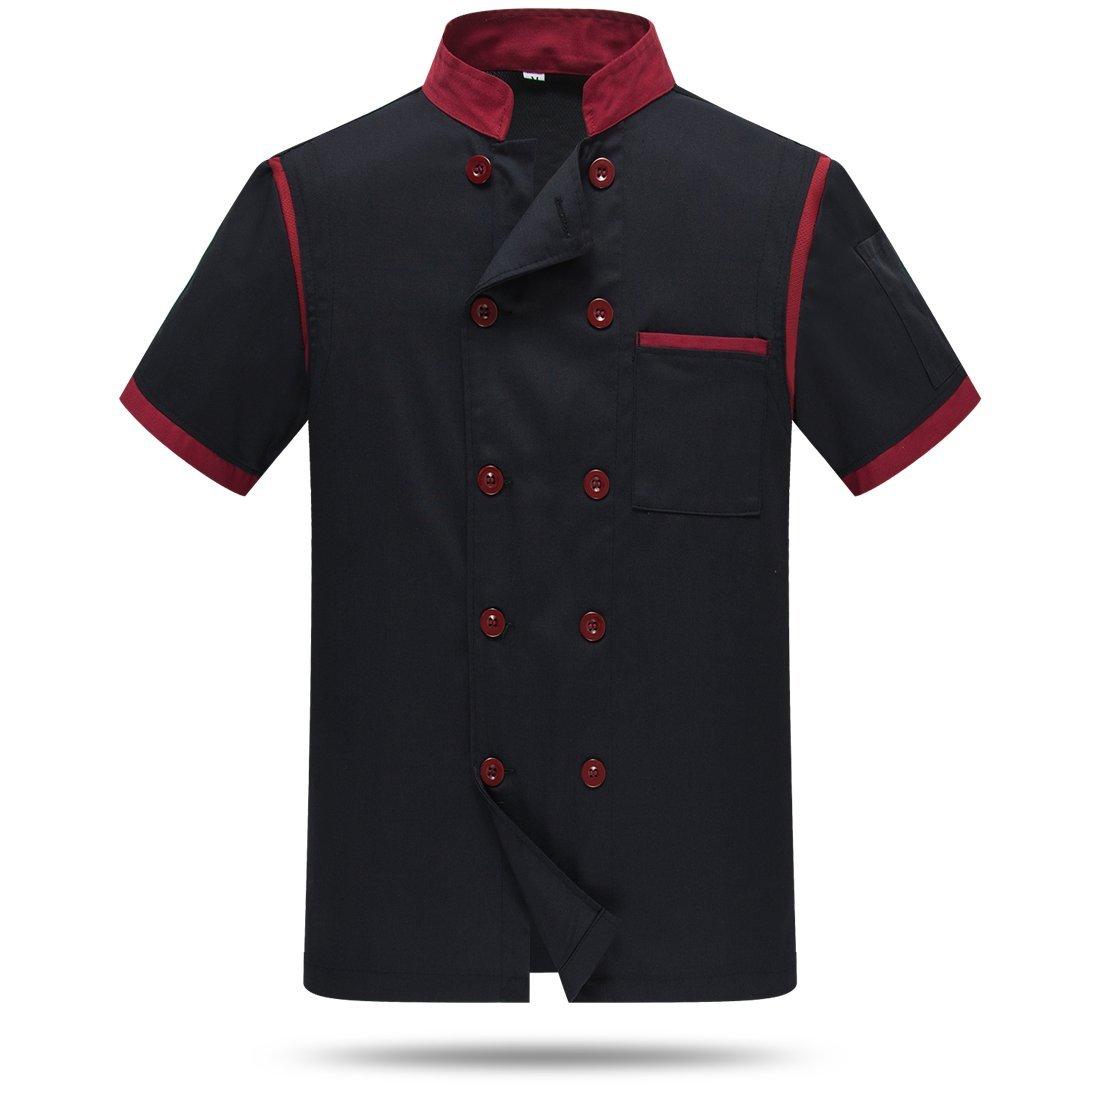 Chef Jackets Waiter Coat Short Sleeves Back and Underarm Mesh Size L (Label:3XL) Black by WAIWAIZUI